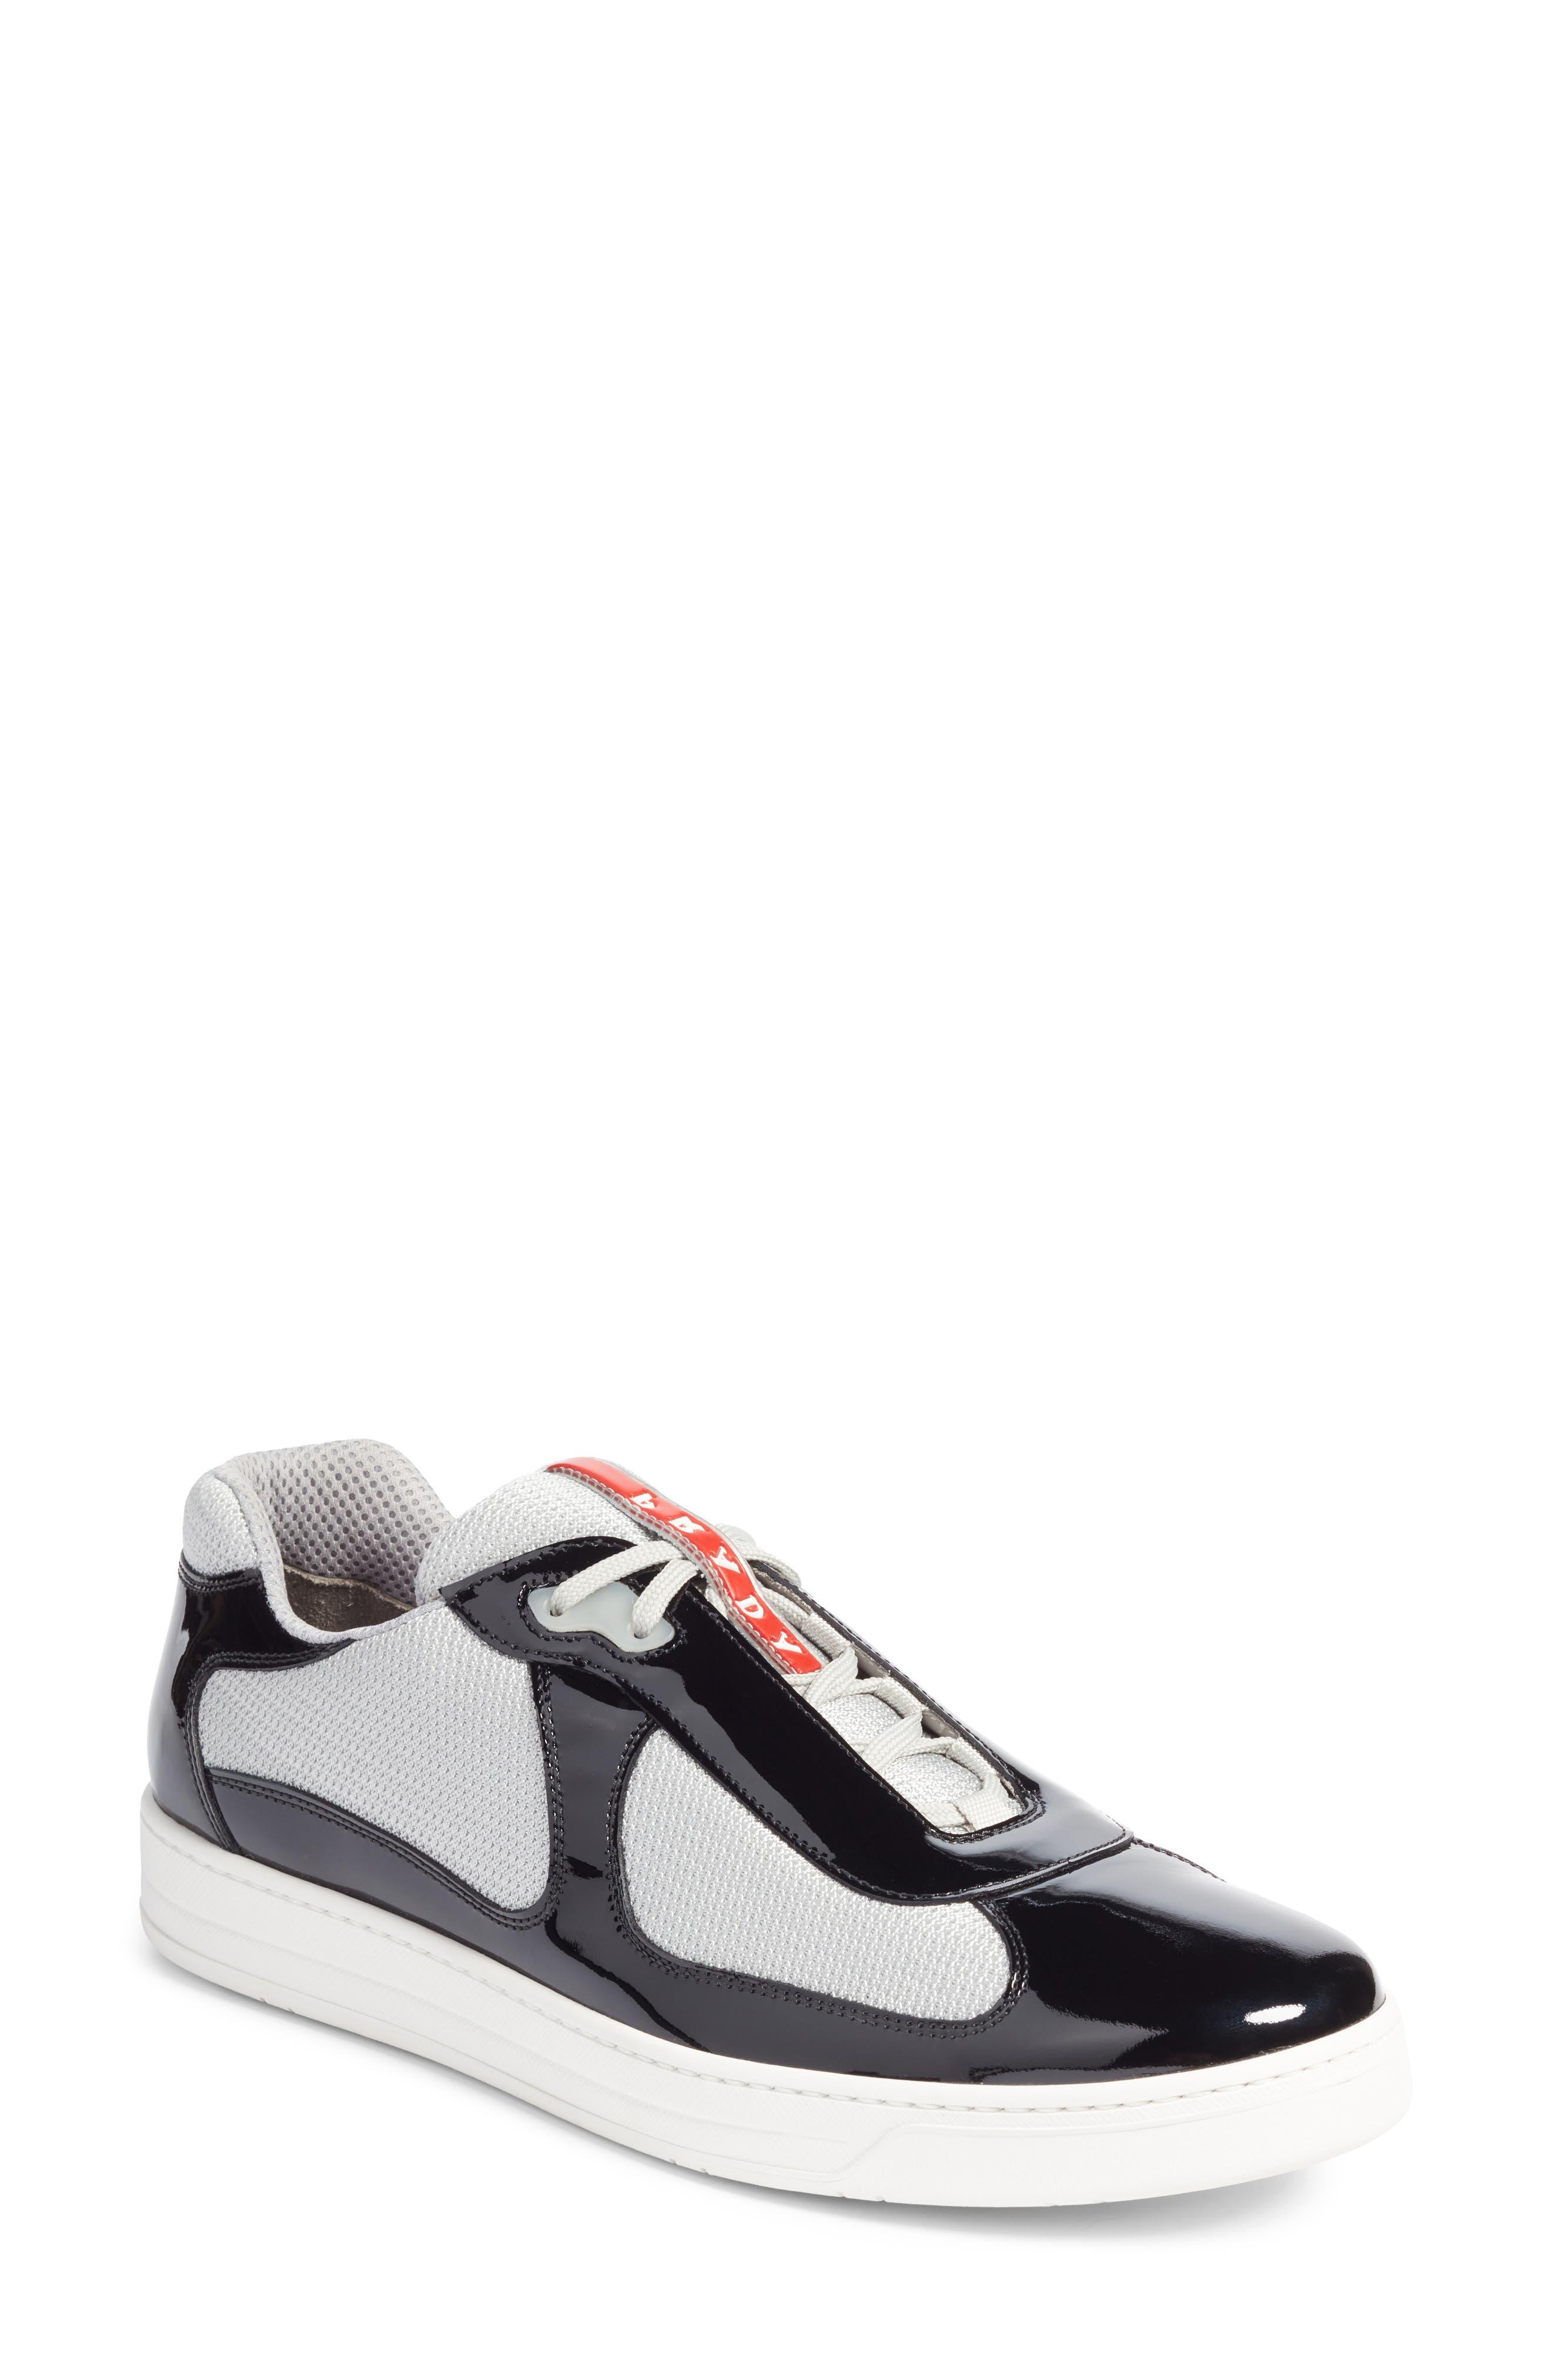 Linea Rossa New America's Cup Sneaker,                             Main thumbnail 1, color,                             Nero Argento